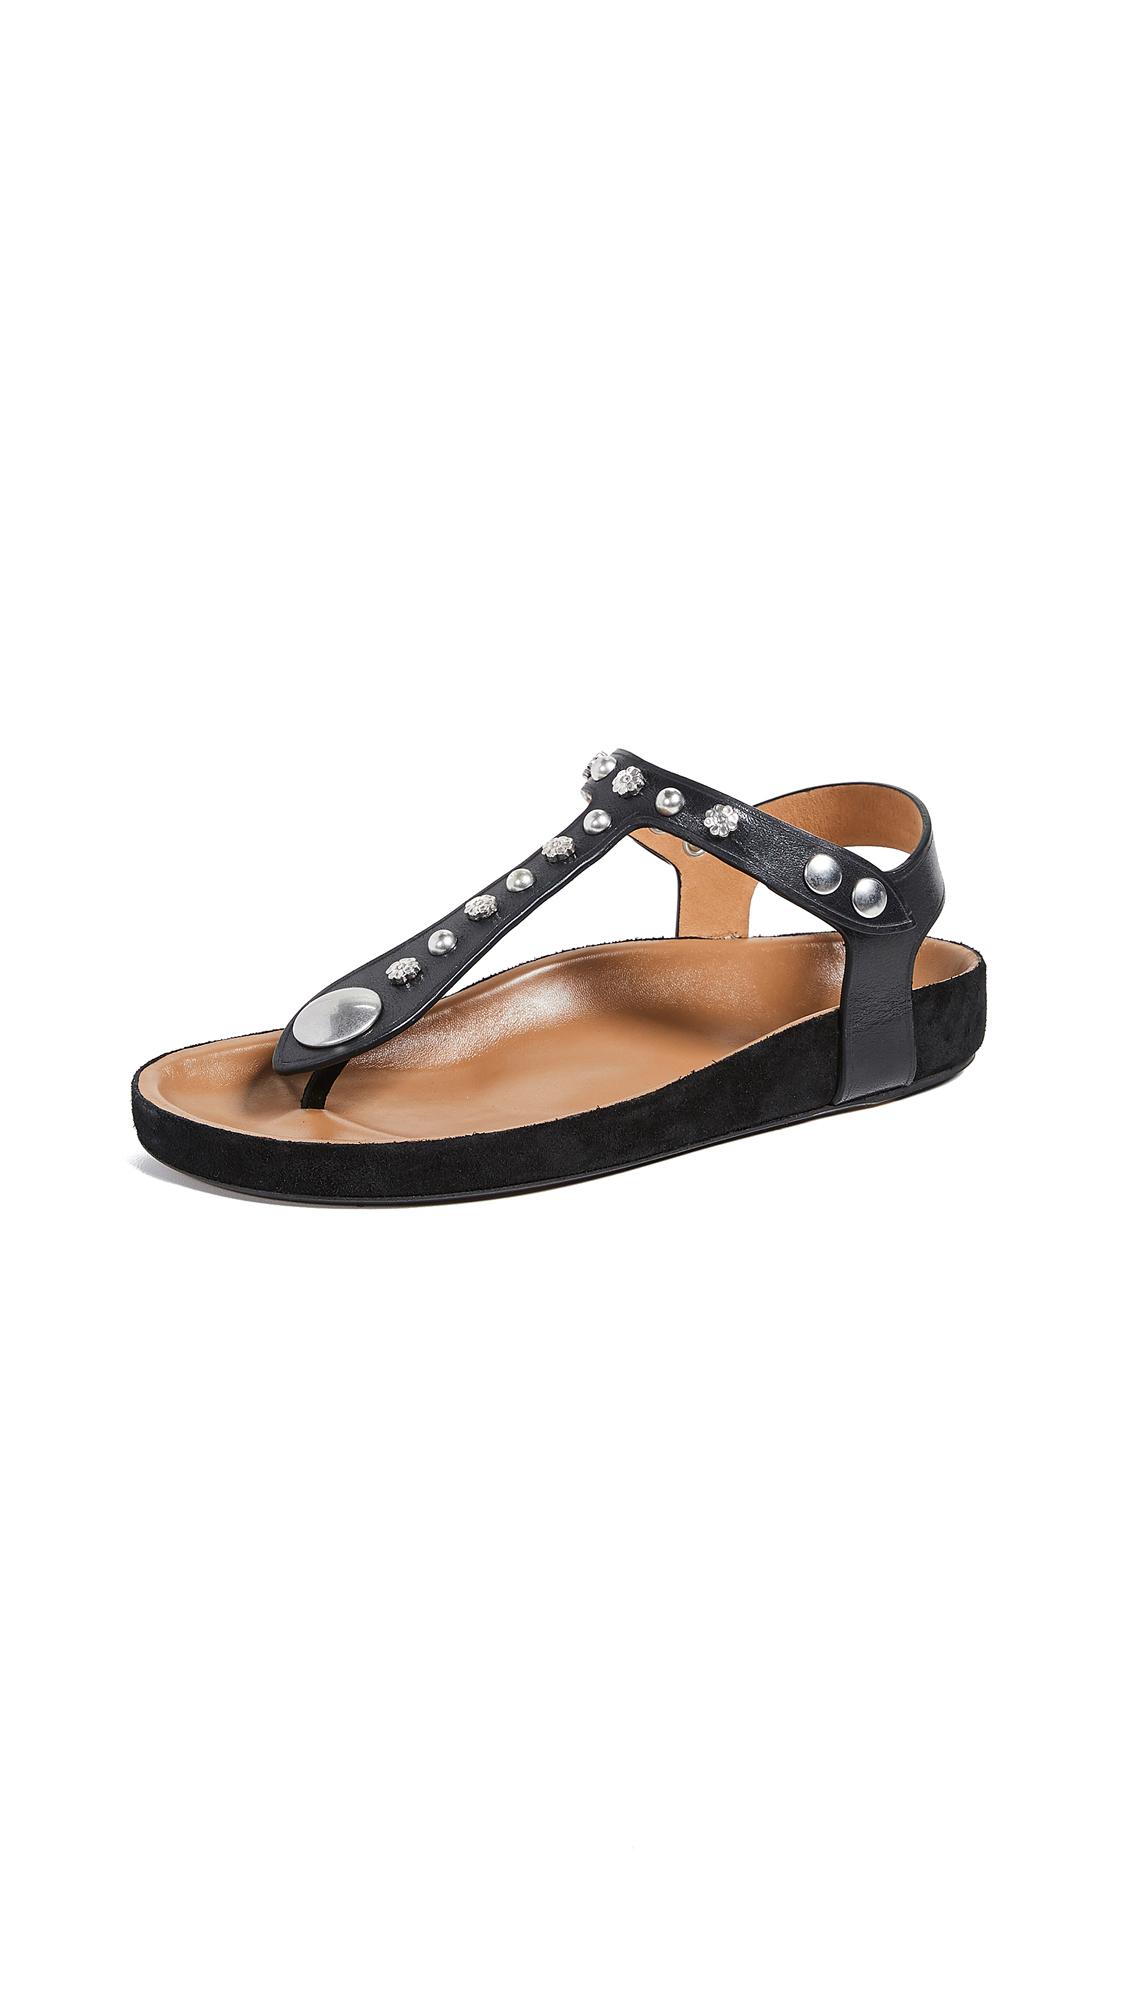 Isabel Marant Enore Sandals - Black